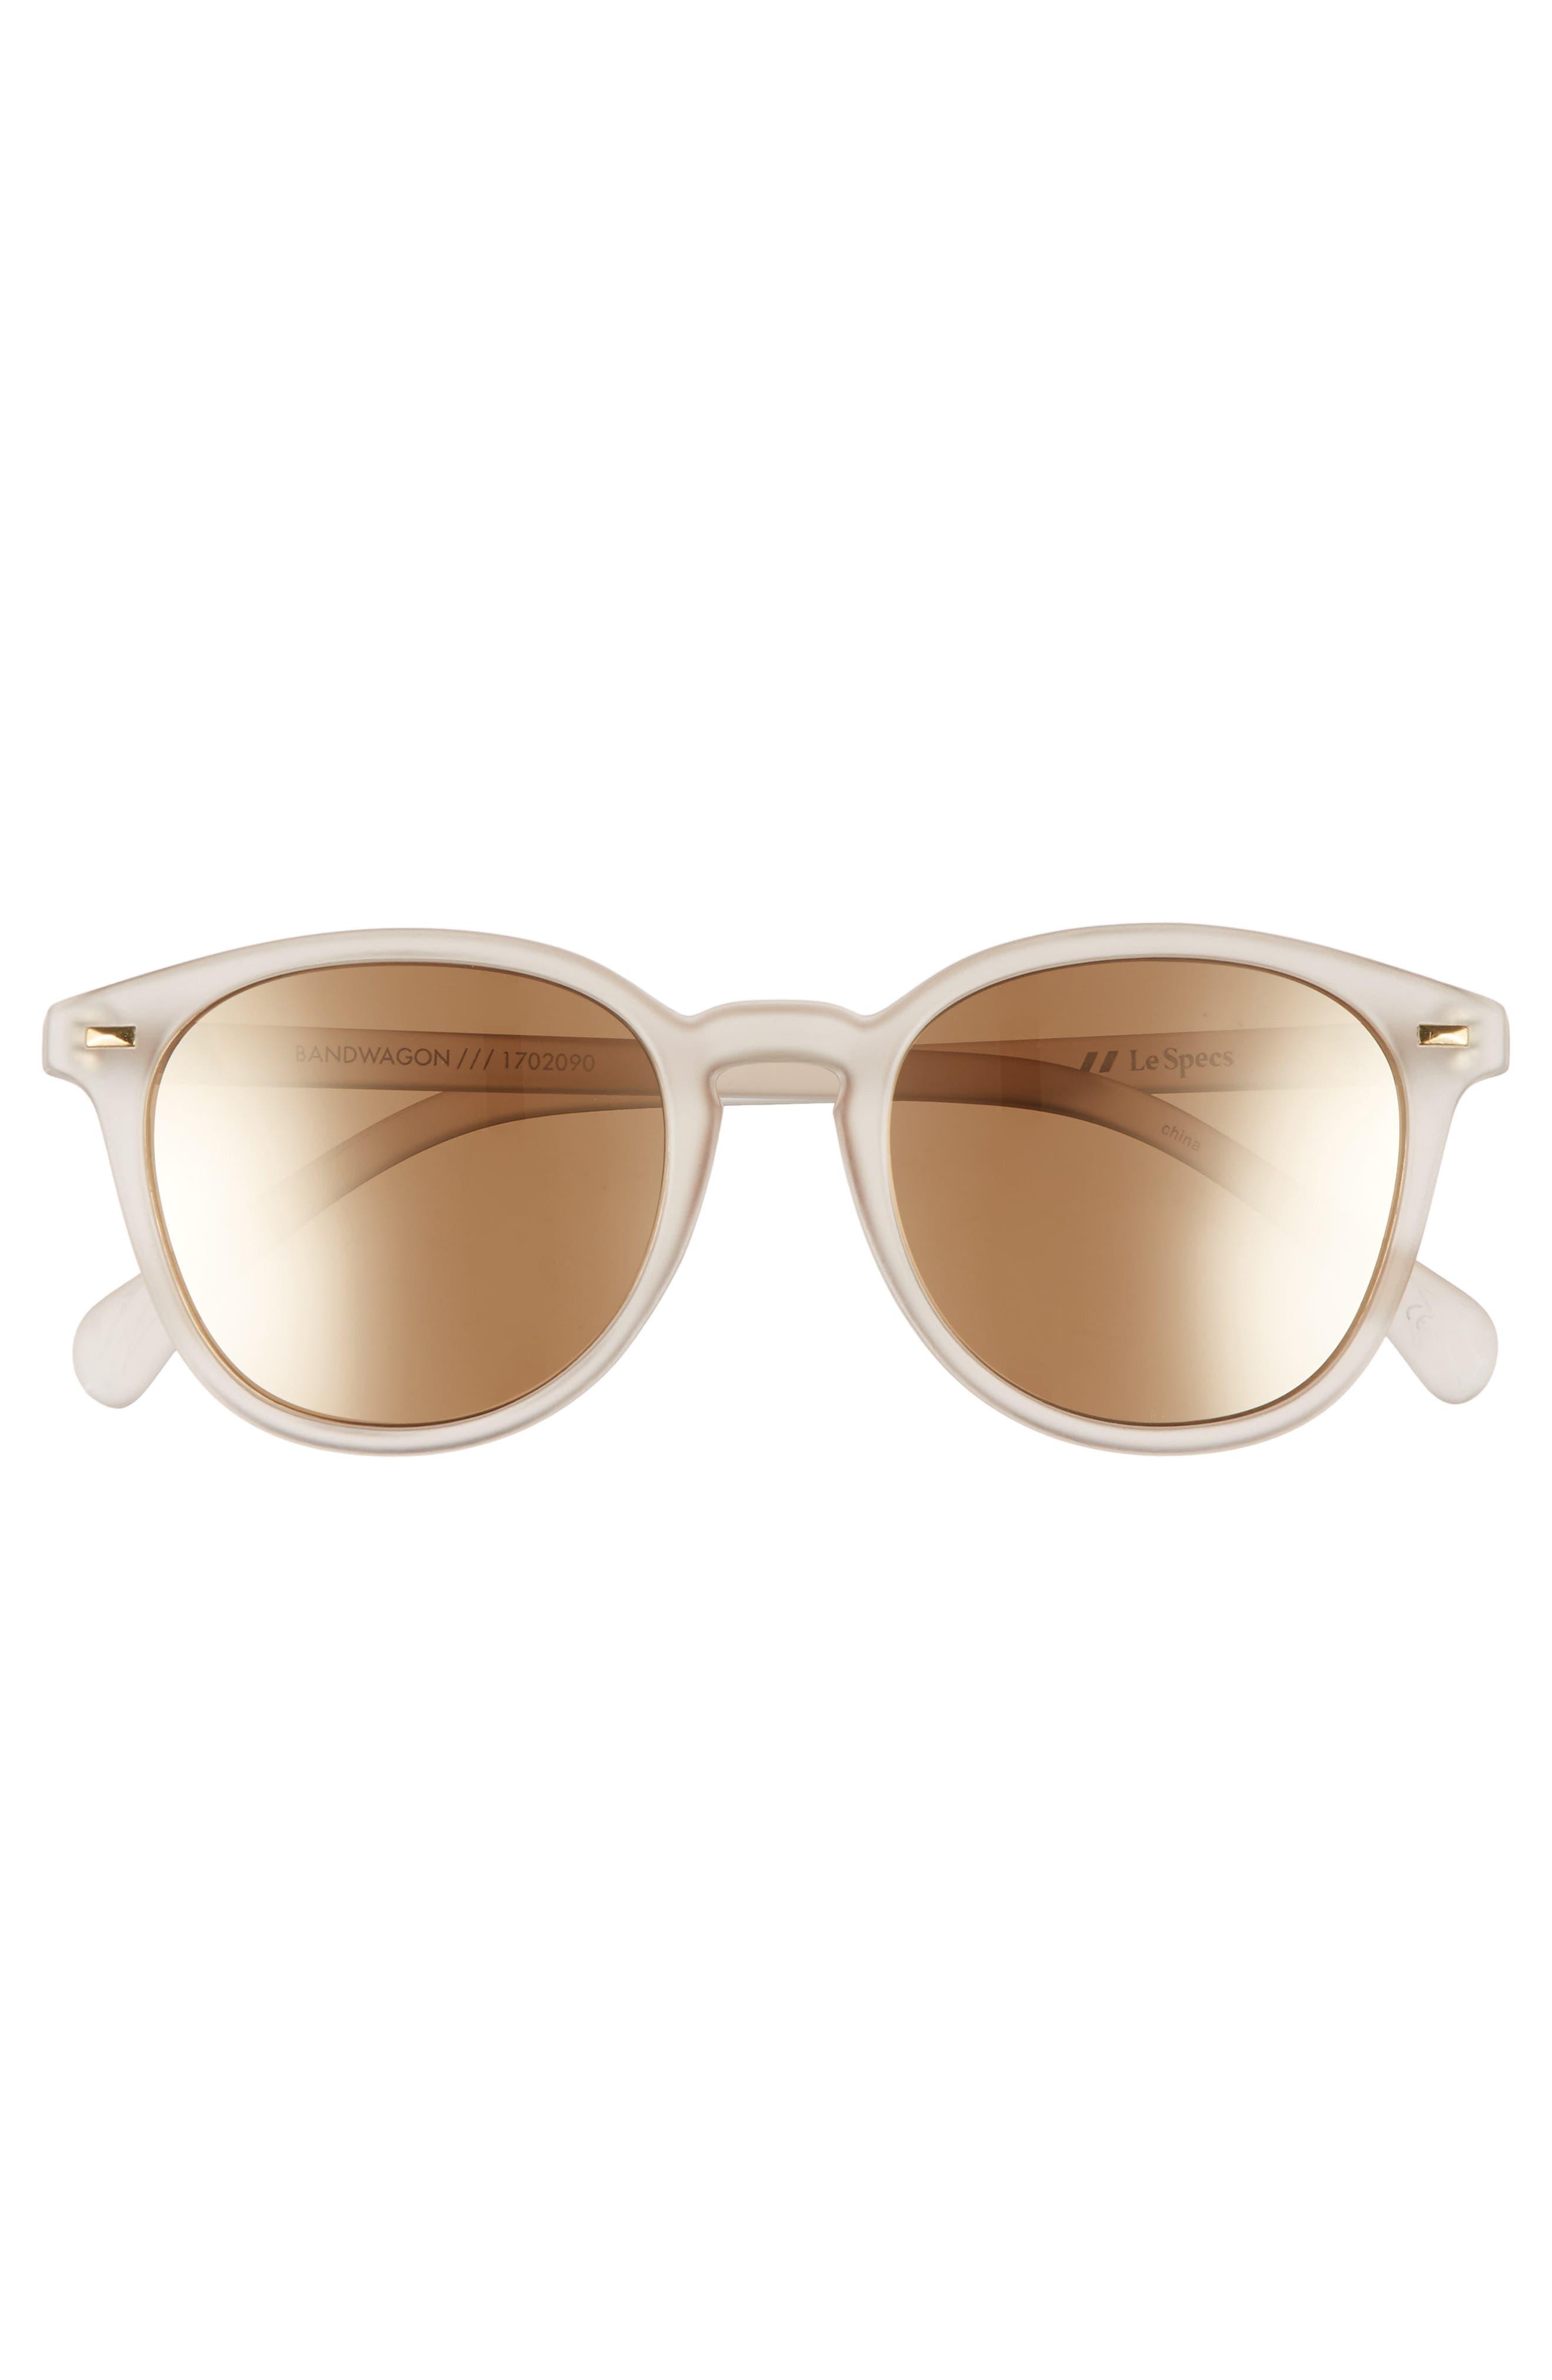 Alternate Image 3  - Le Specs 'Bandwagon' 51mm Sunglasses